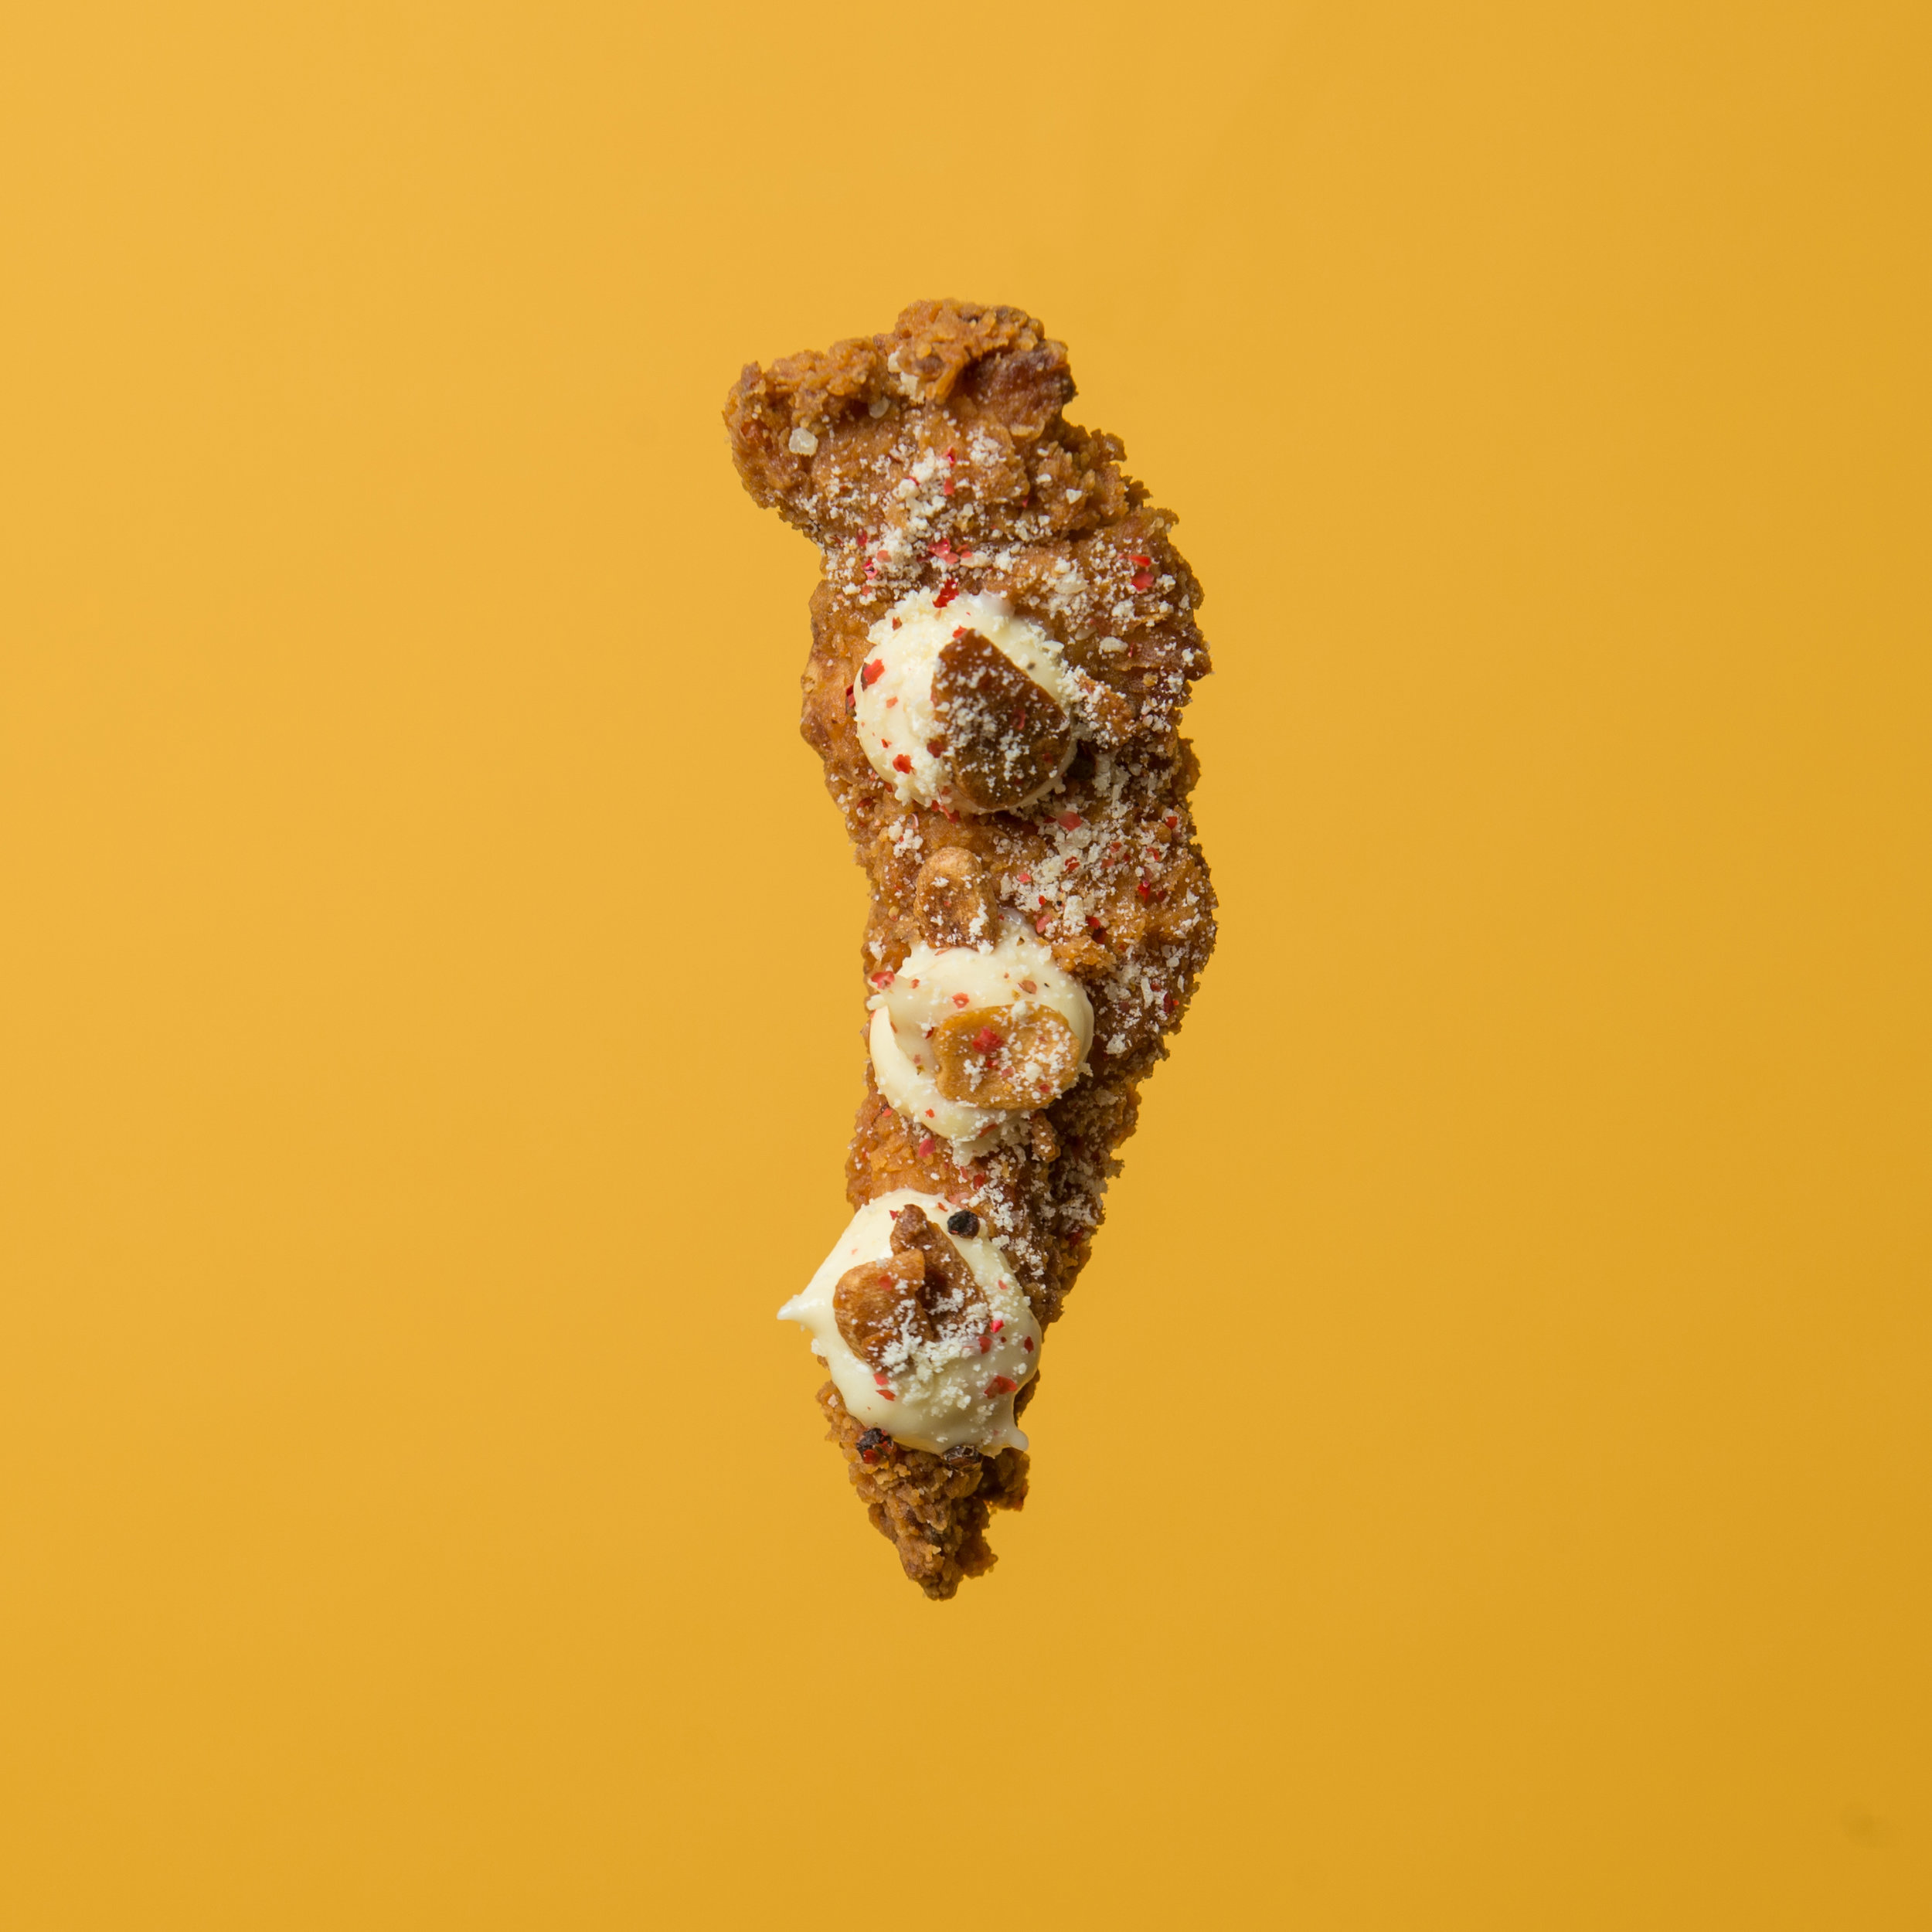 Sticky's Chicken Fingers, 2017